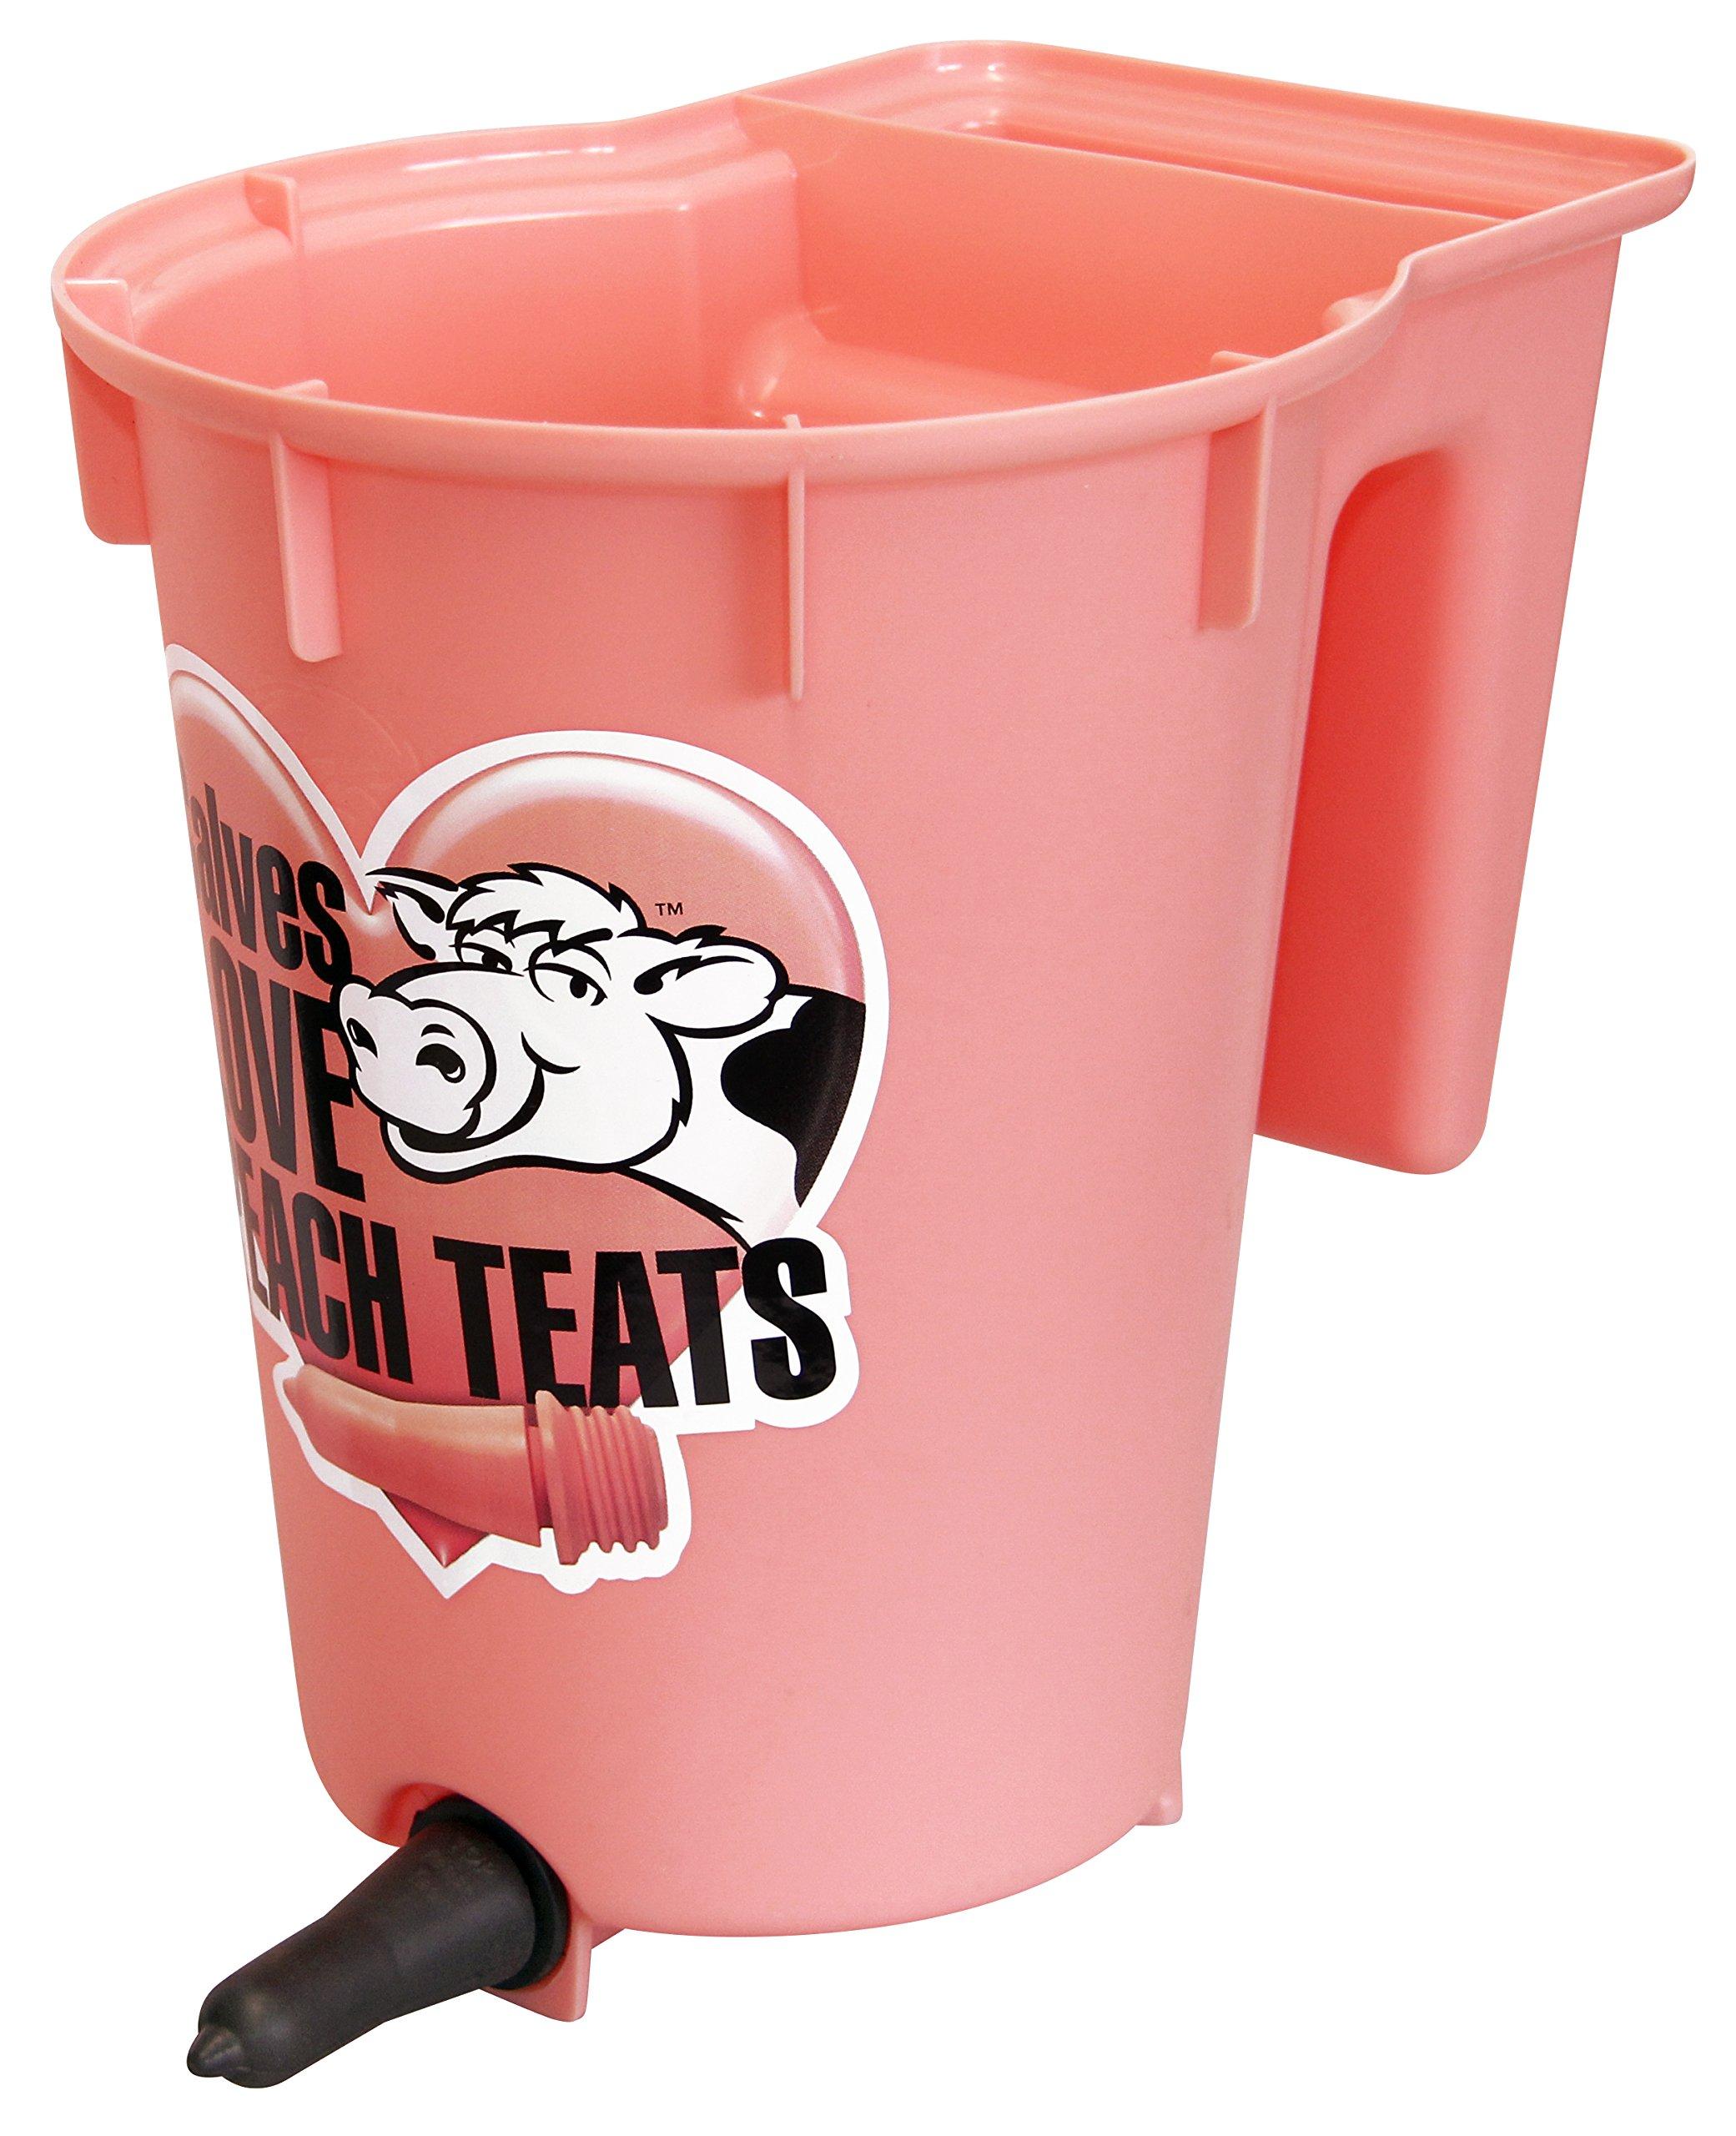 Peach Teats PT-1 82035 Single Feeder Bucke, Pink by Peach Teats